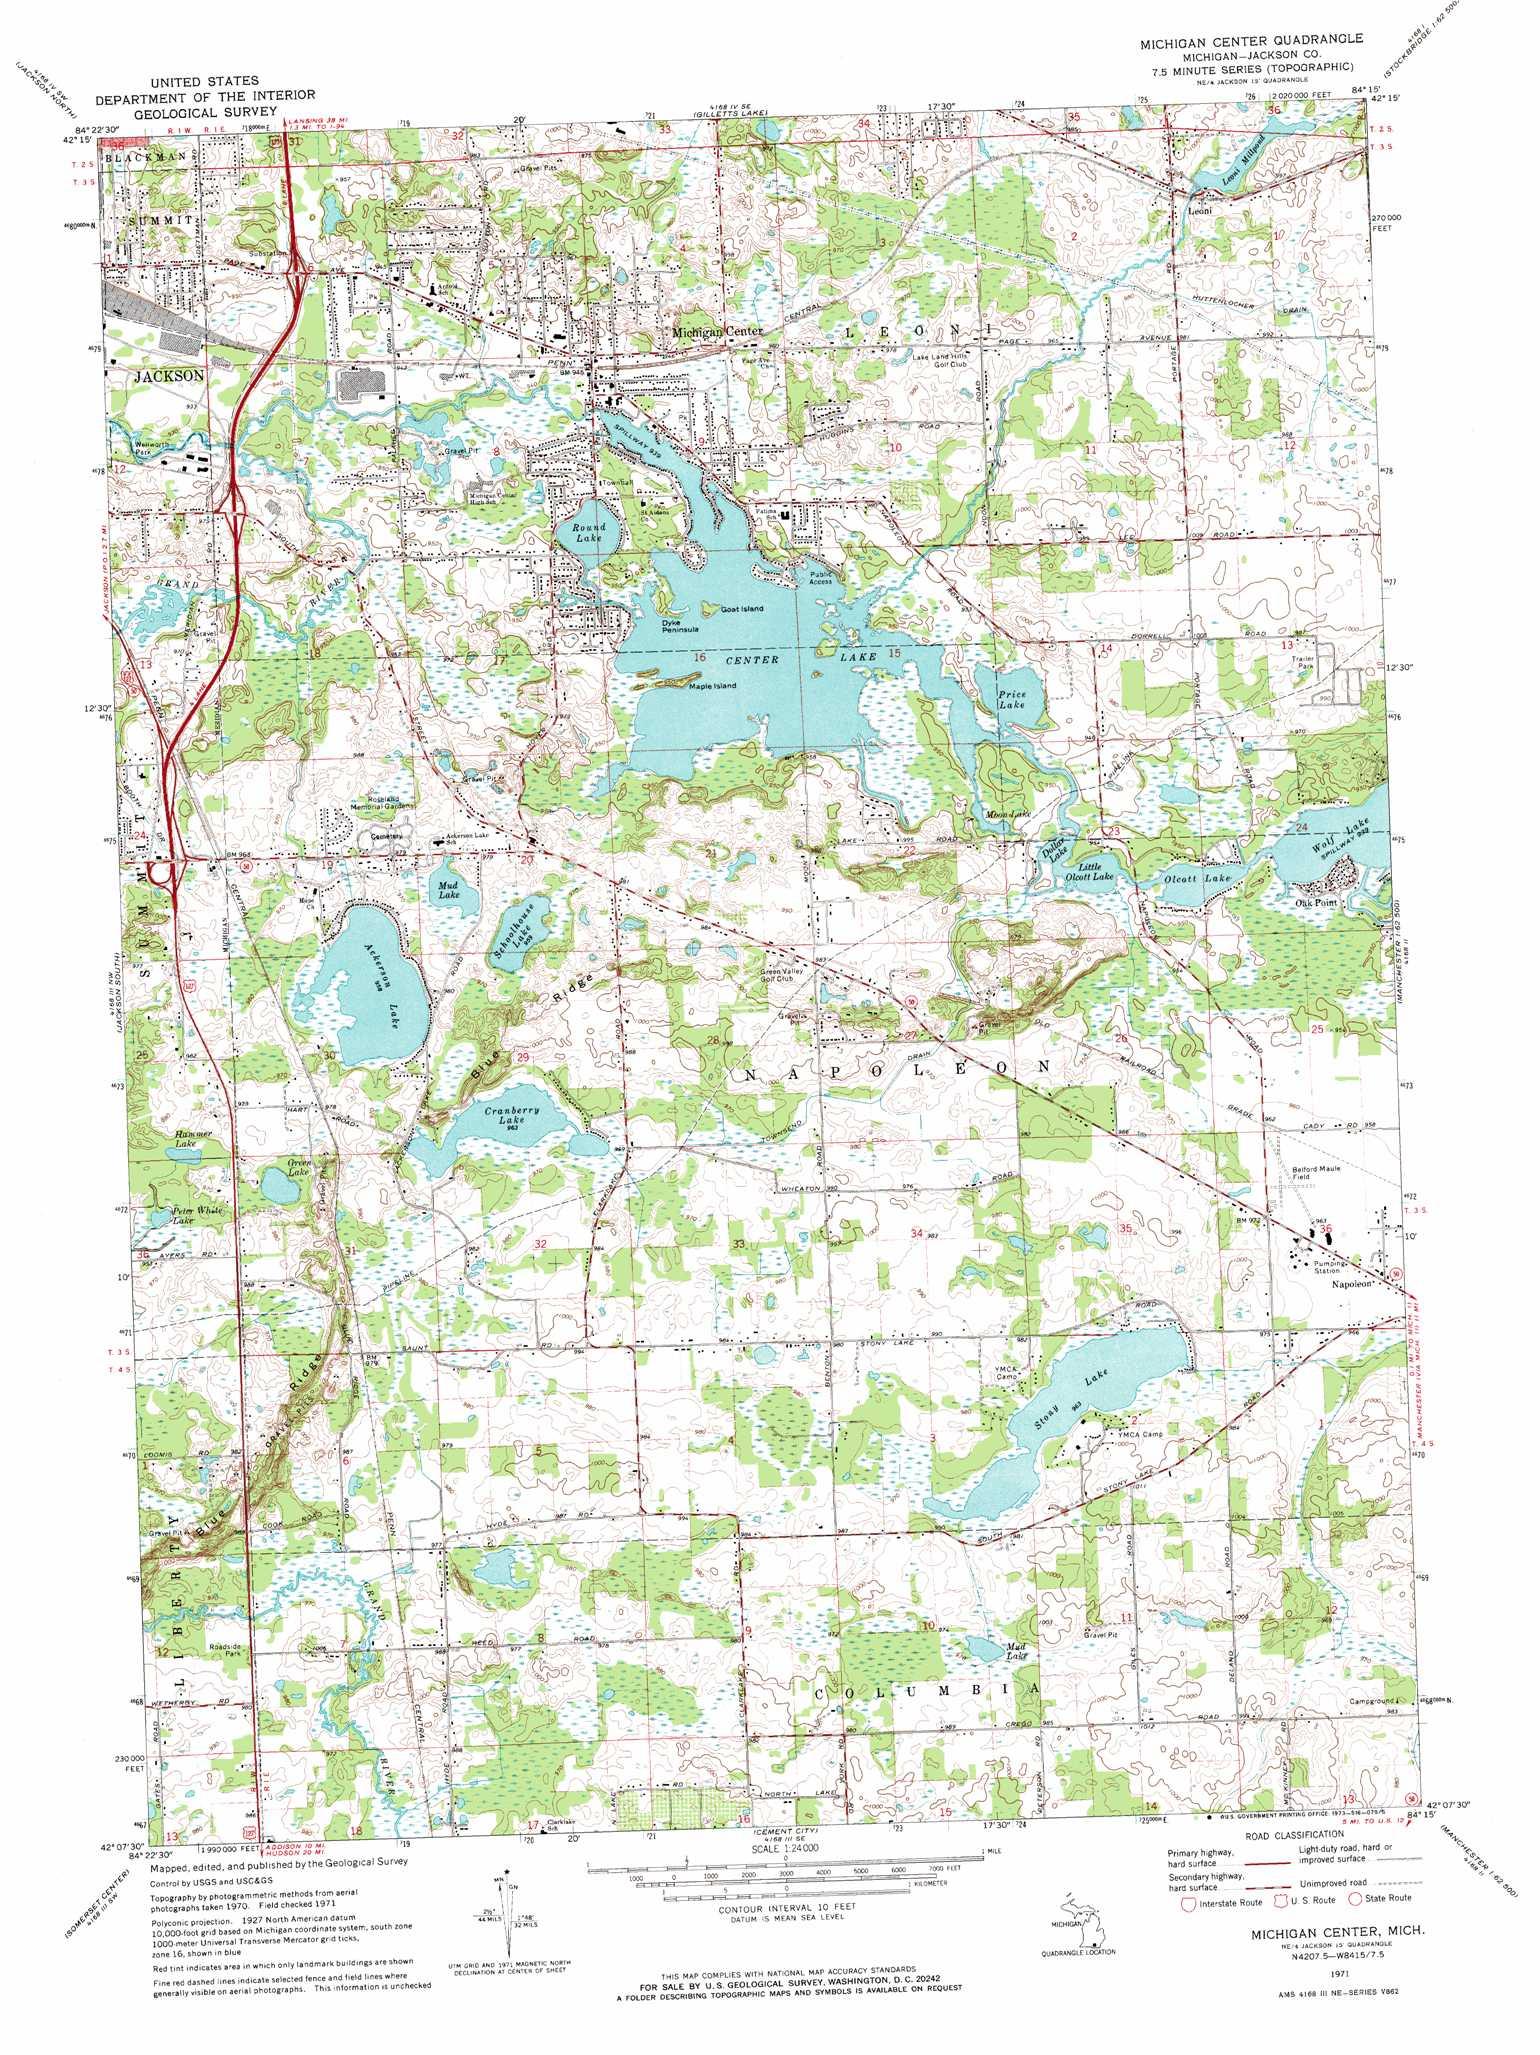 michigan center lake map Michigan Center Topographic Map Mi Usgs Topo Quad 42084b3 michigan center lake map